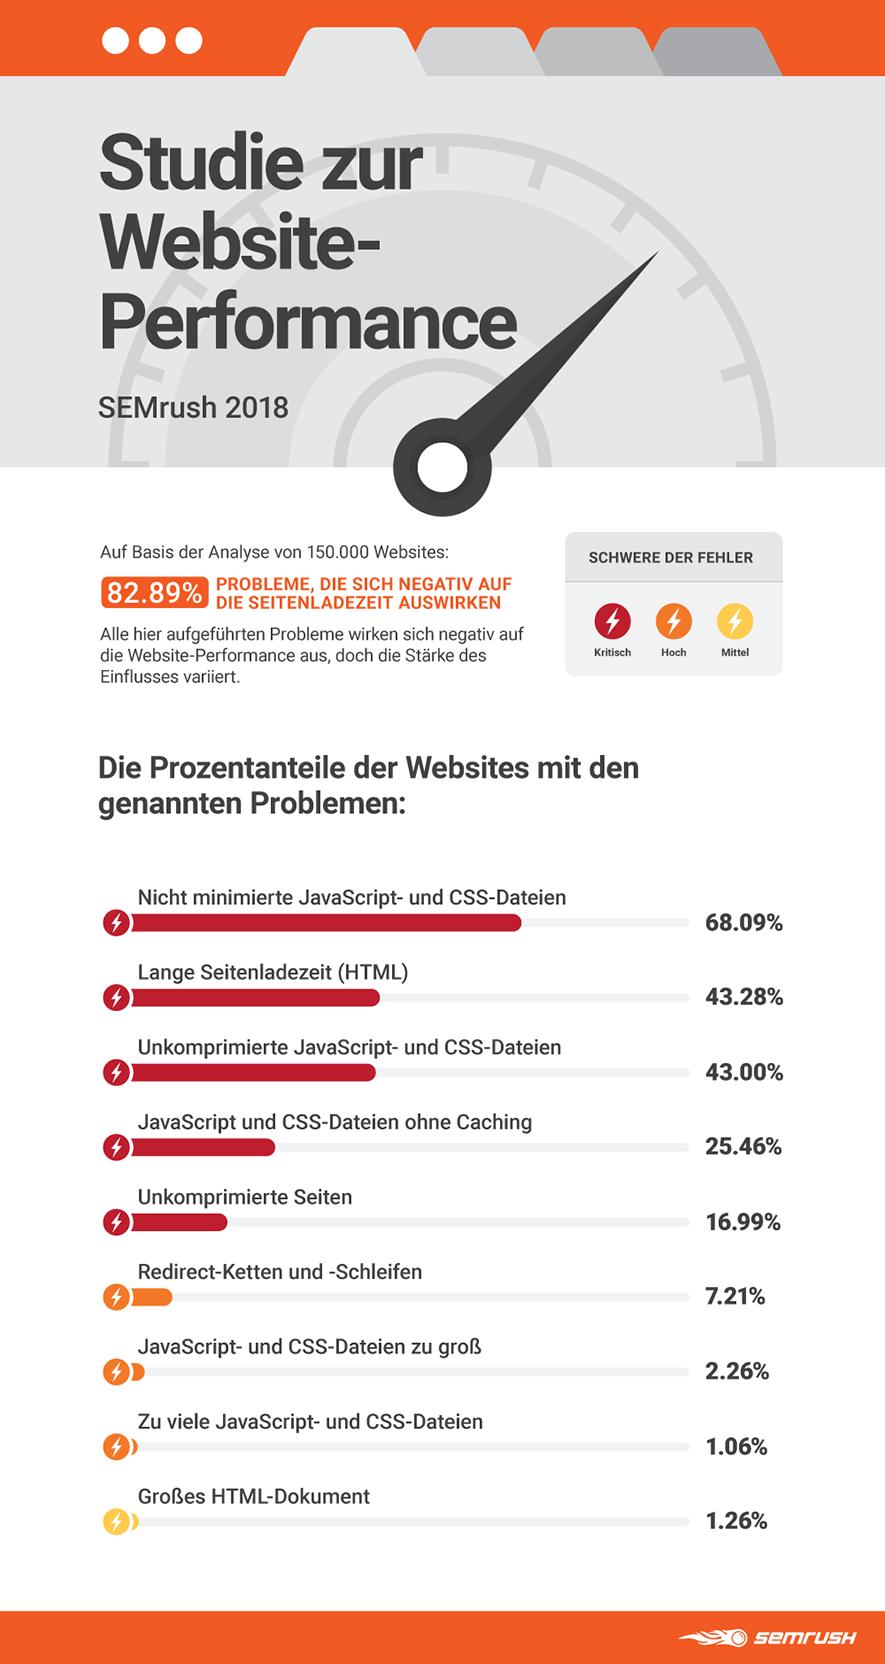 website-performance-research-semrush-2018-main-de.png